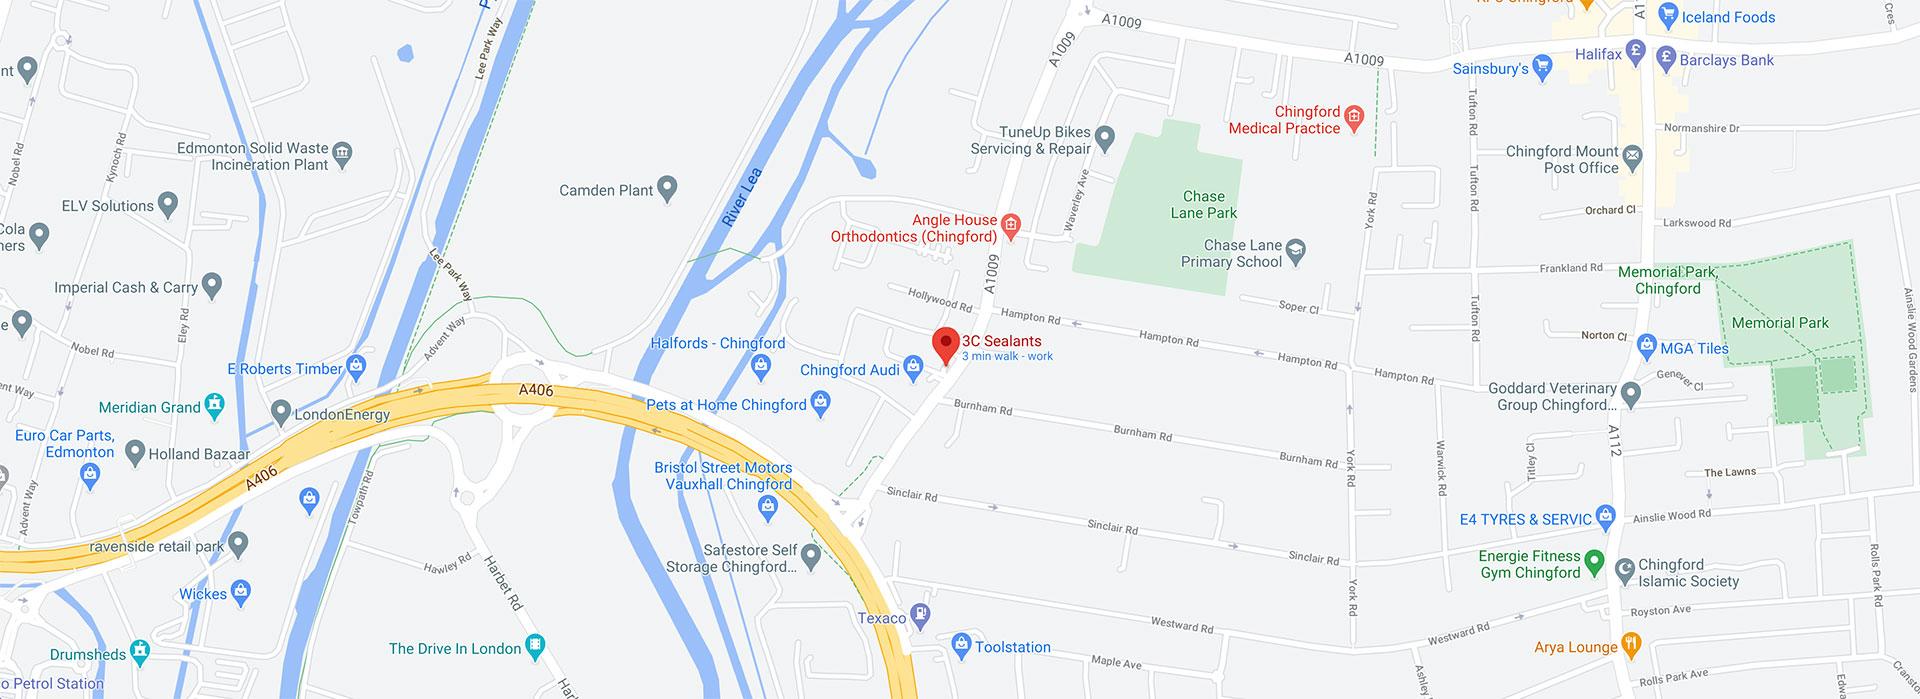 3C Sealants On The Map